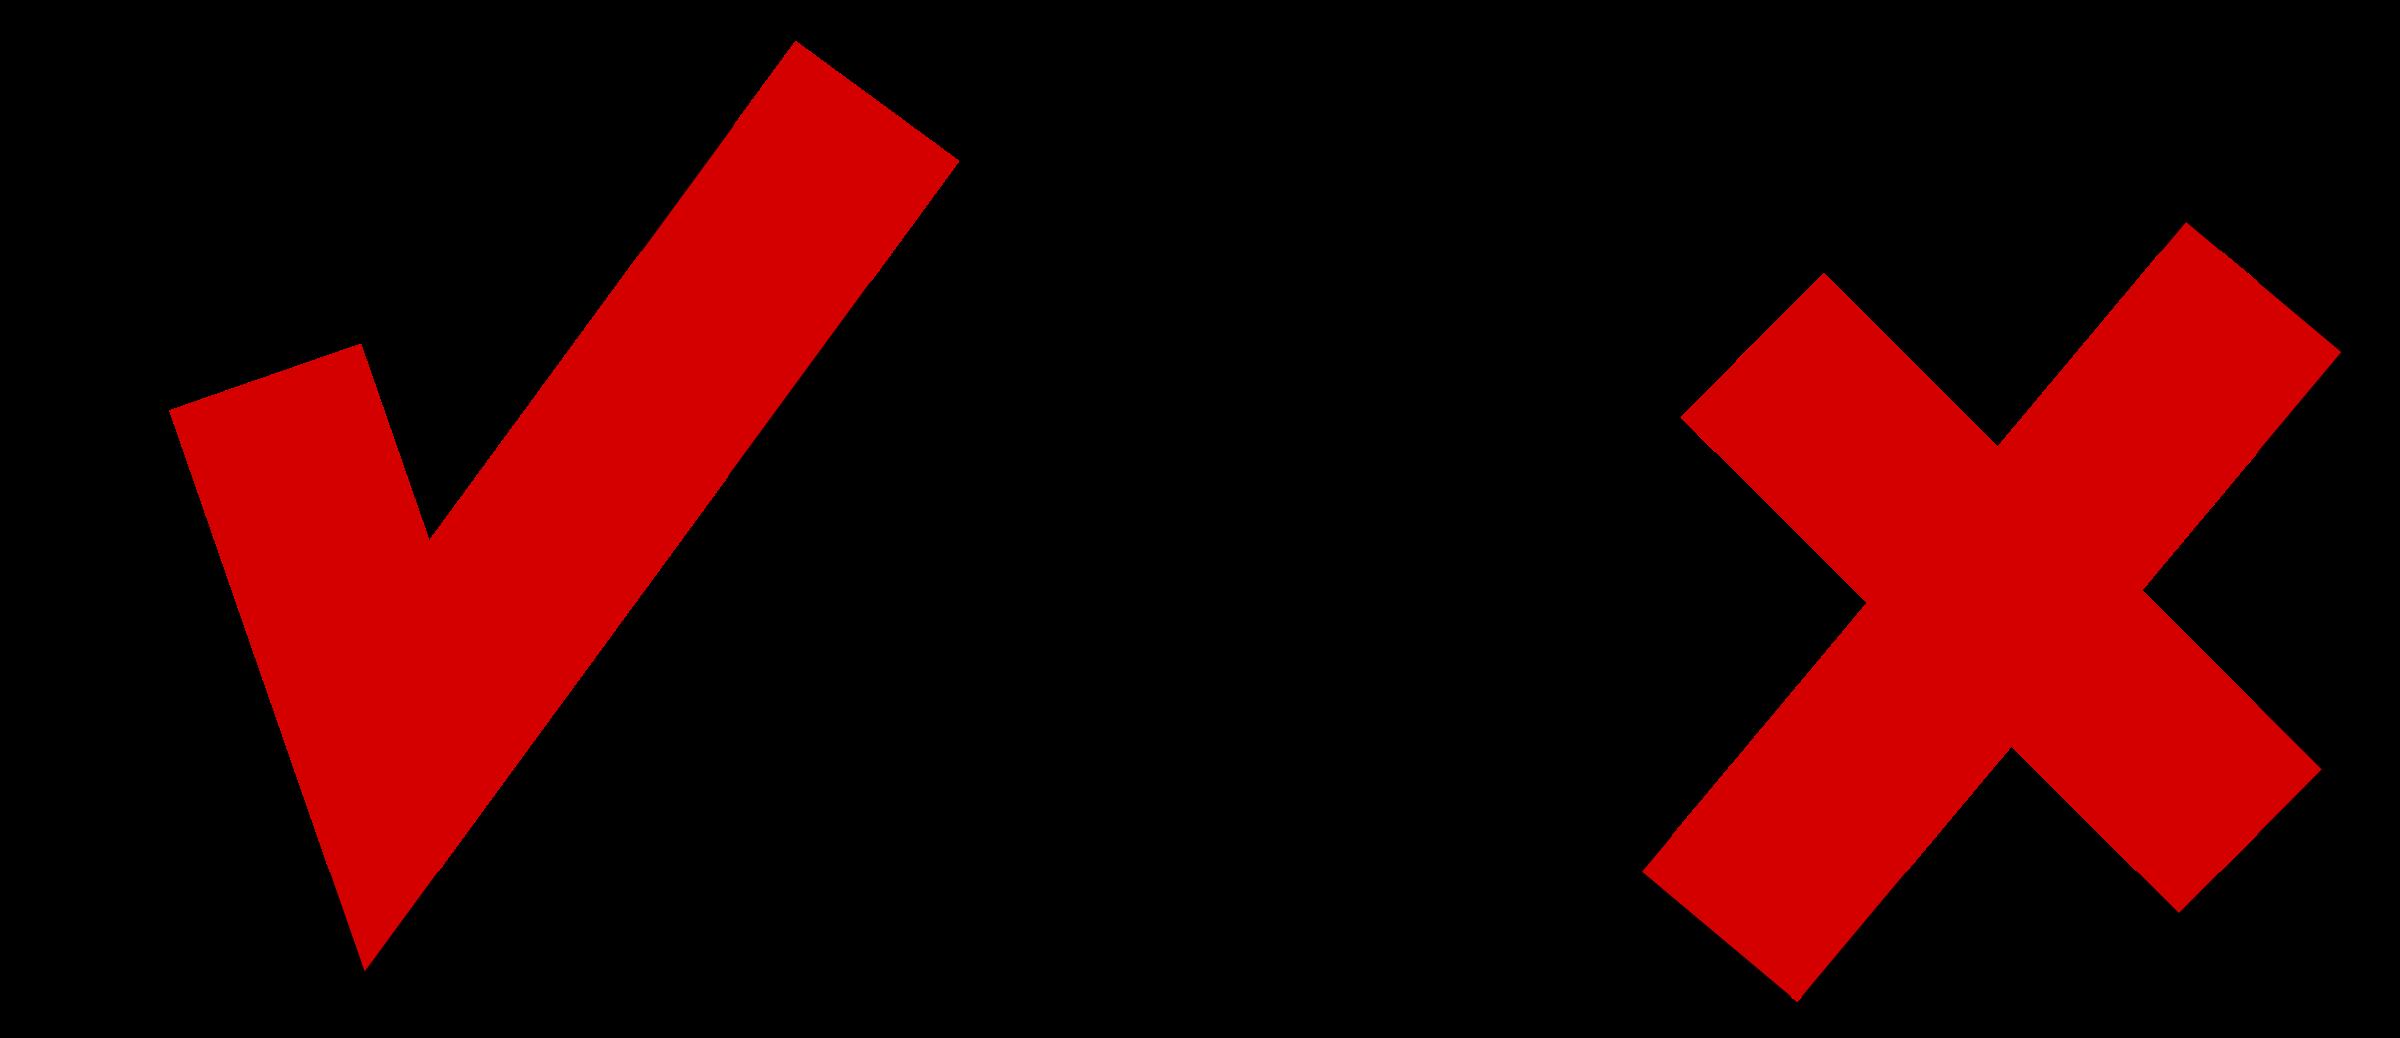 Cross Symbol For Clipart.